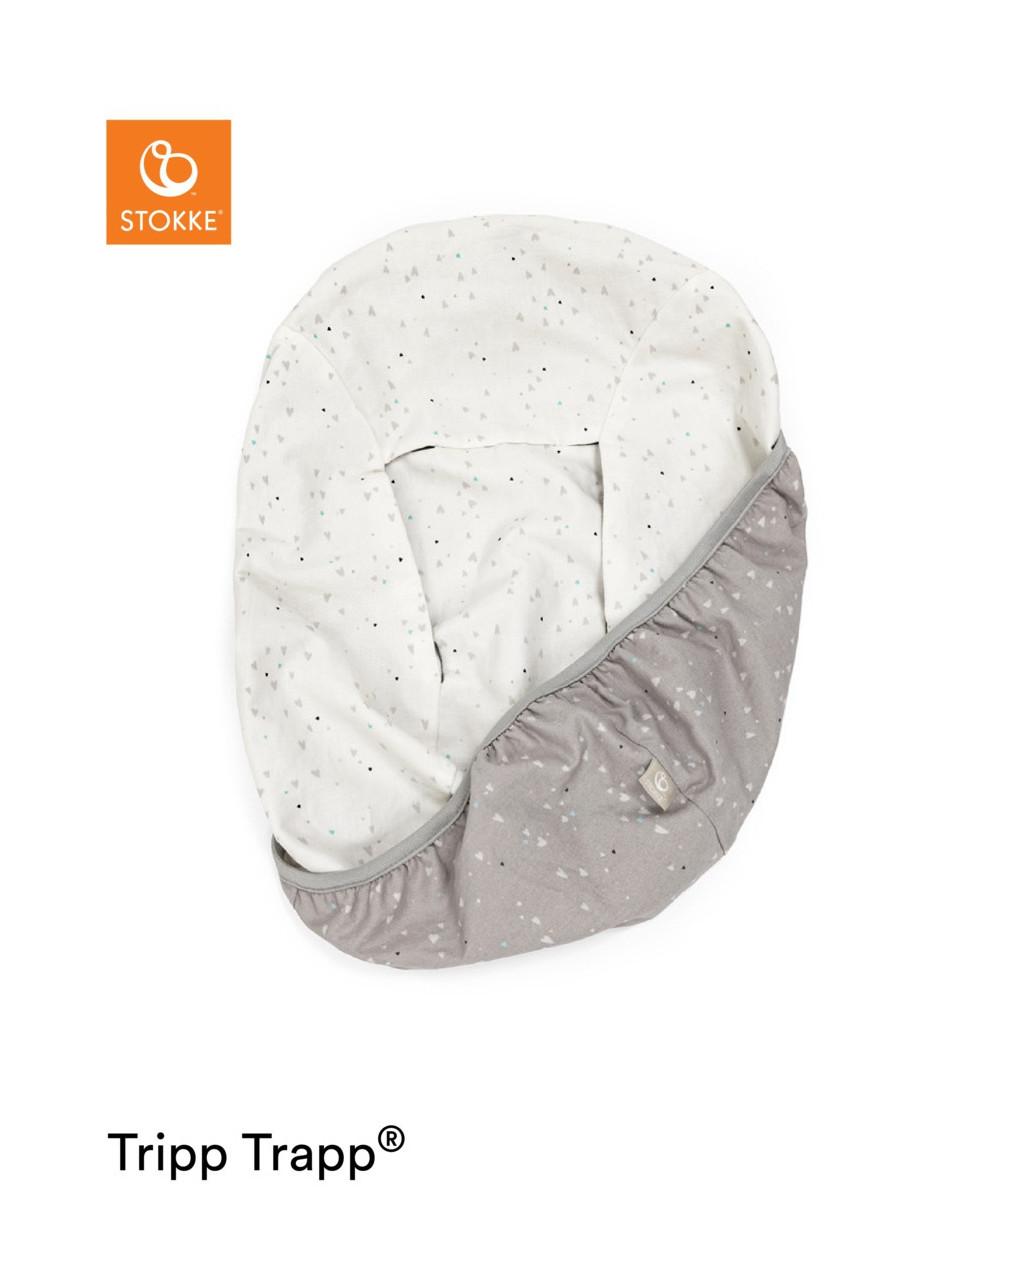 Rivestimento per il tripp trapp® newborn set - sweet hearts - Stokke